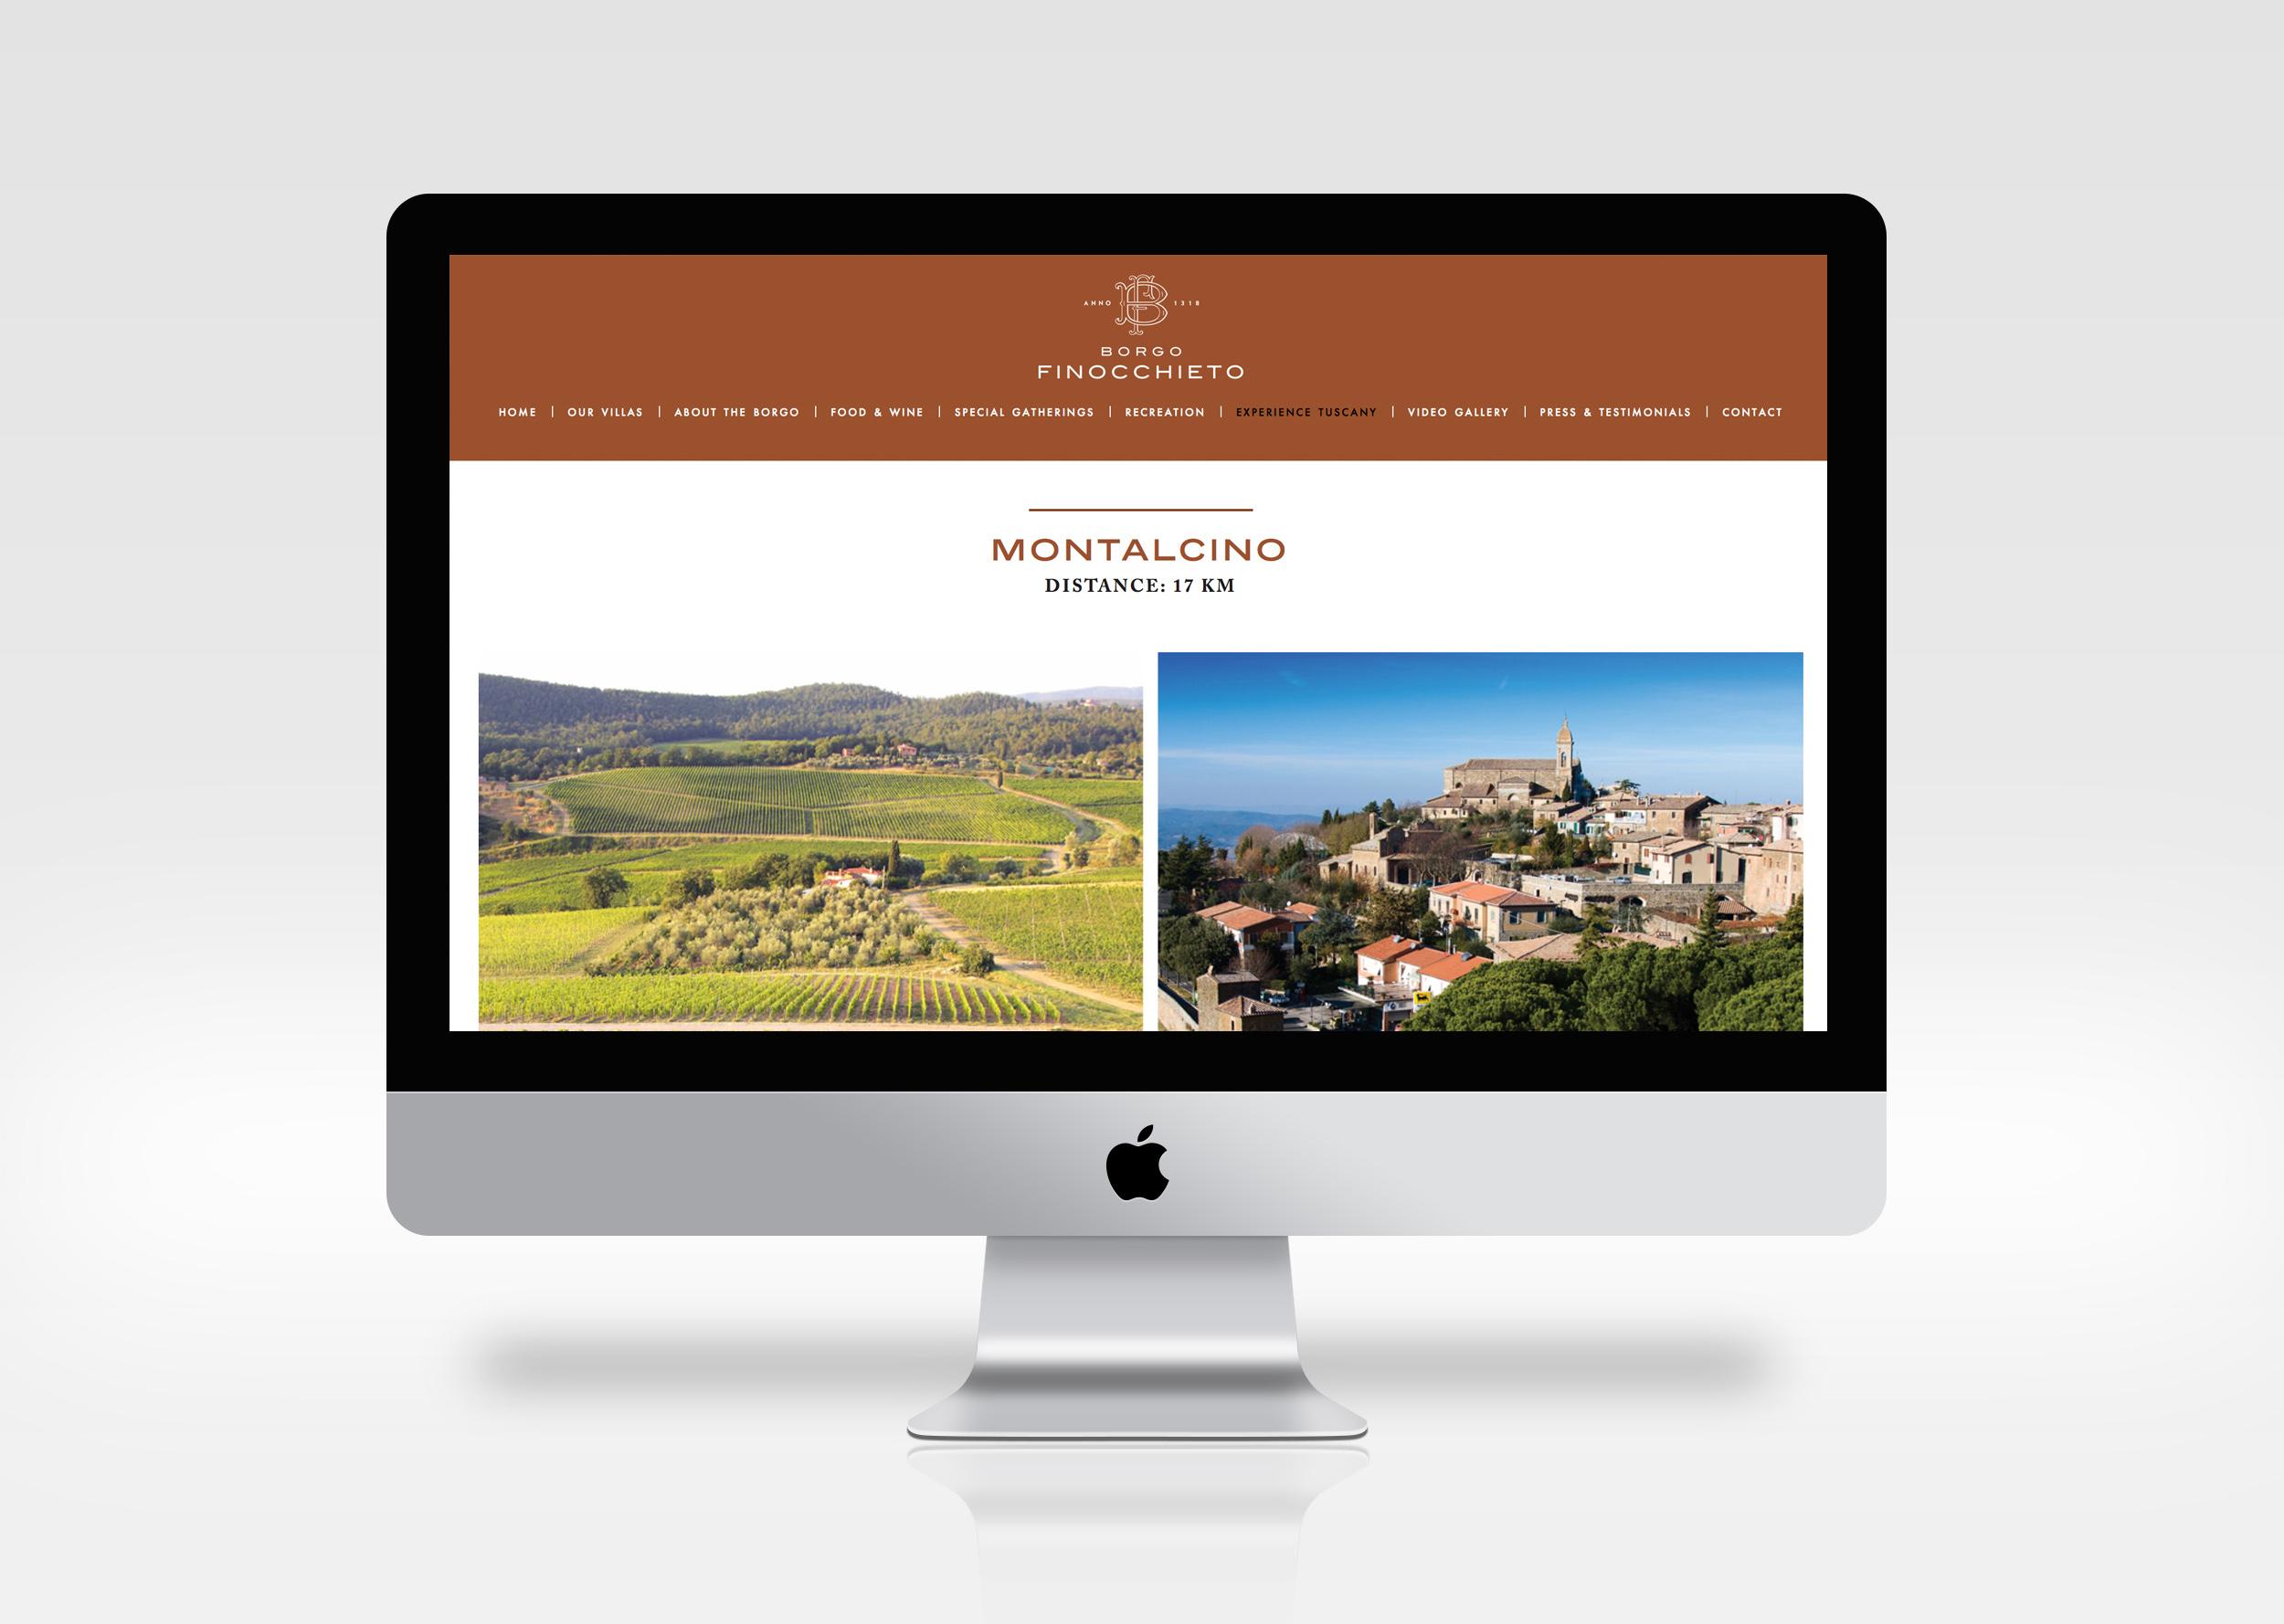 Borgo_Web_3-w.jpg